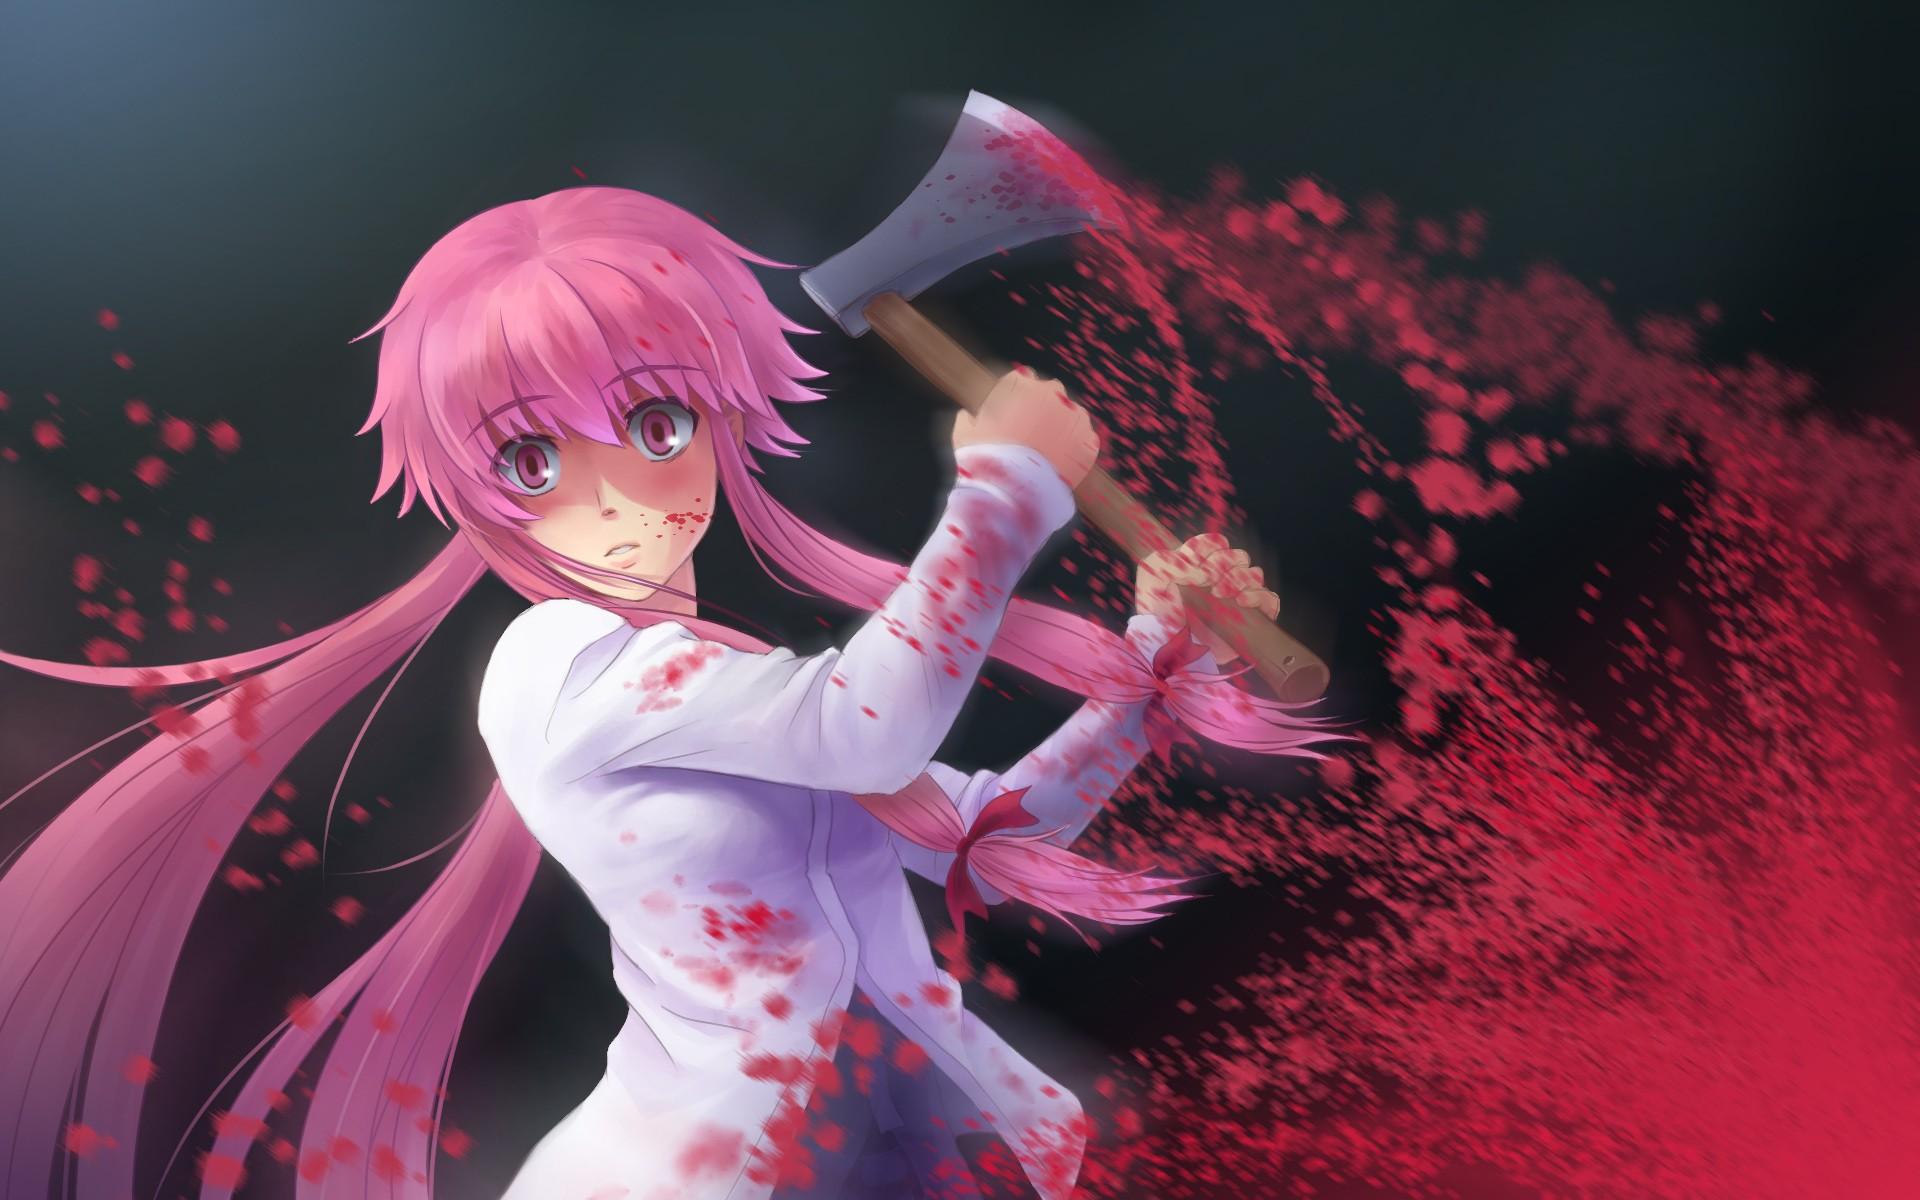 Gasai Yuno Wallpaper: Wallpaper : Anime Girls, Red, Blood, Axes, Mirai Nikki